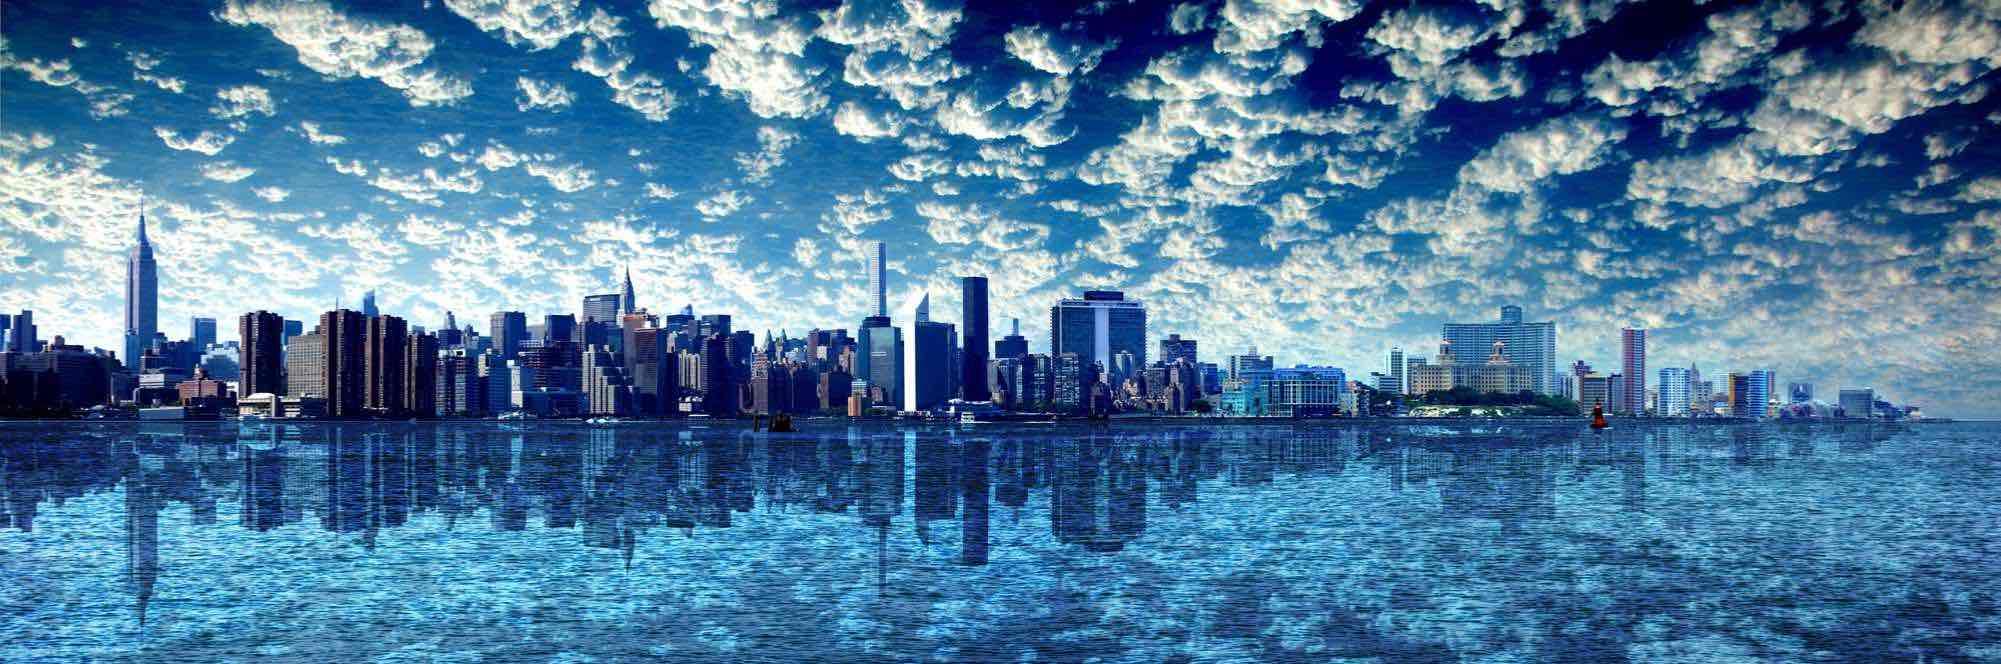 Obra: Havana-New York